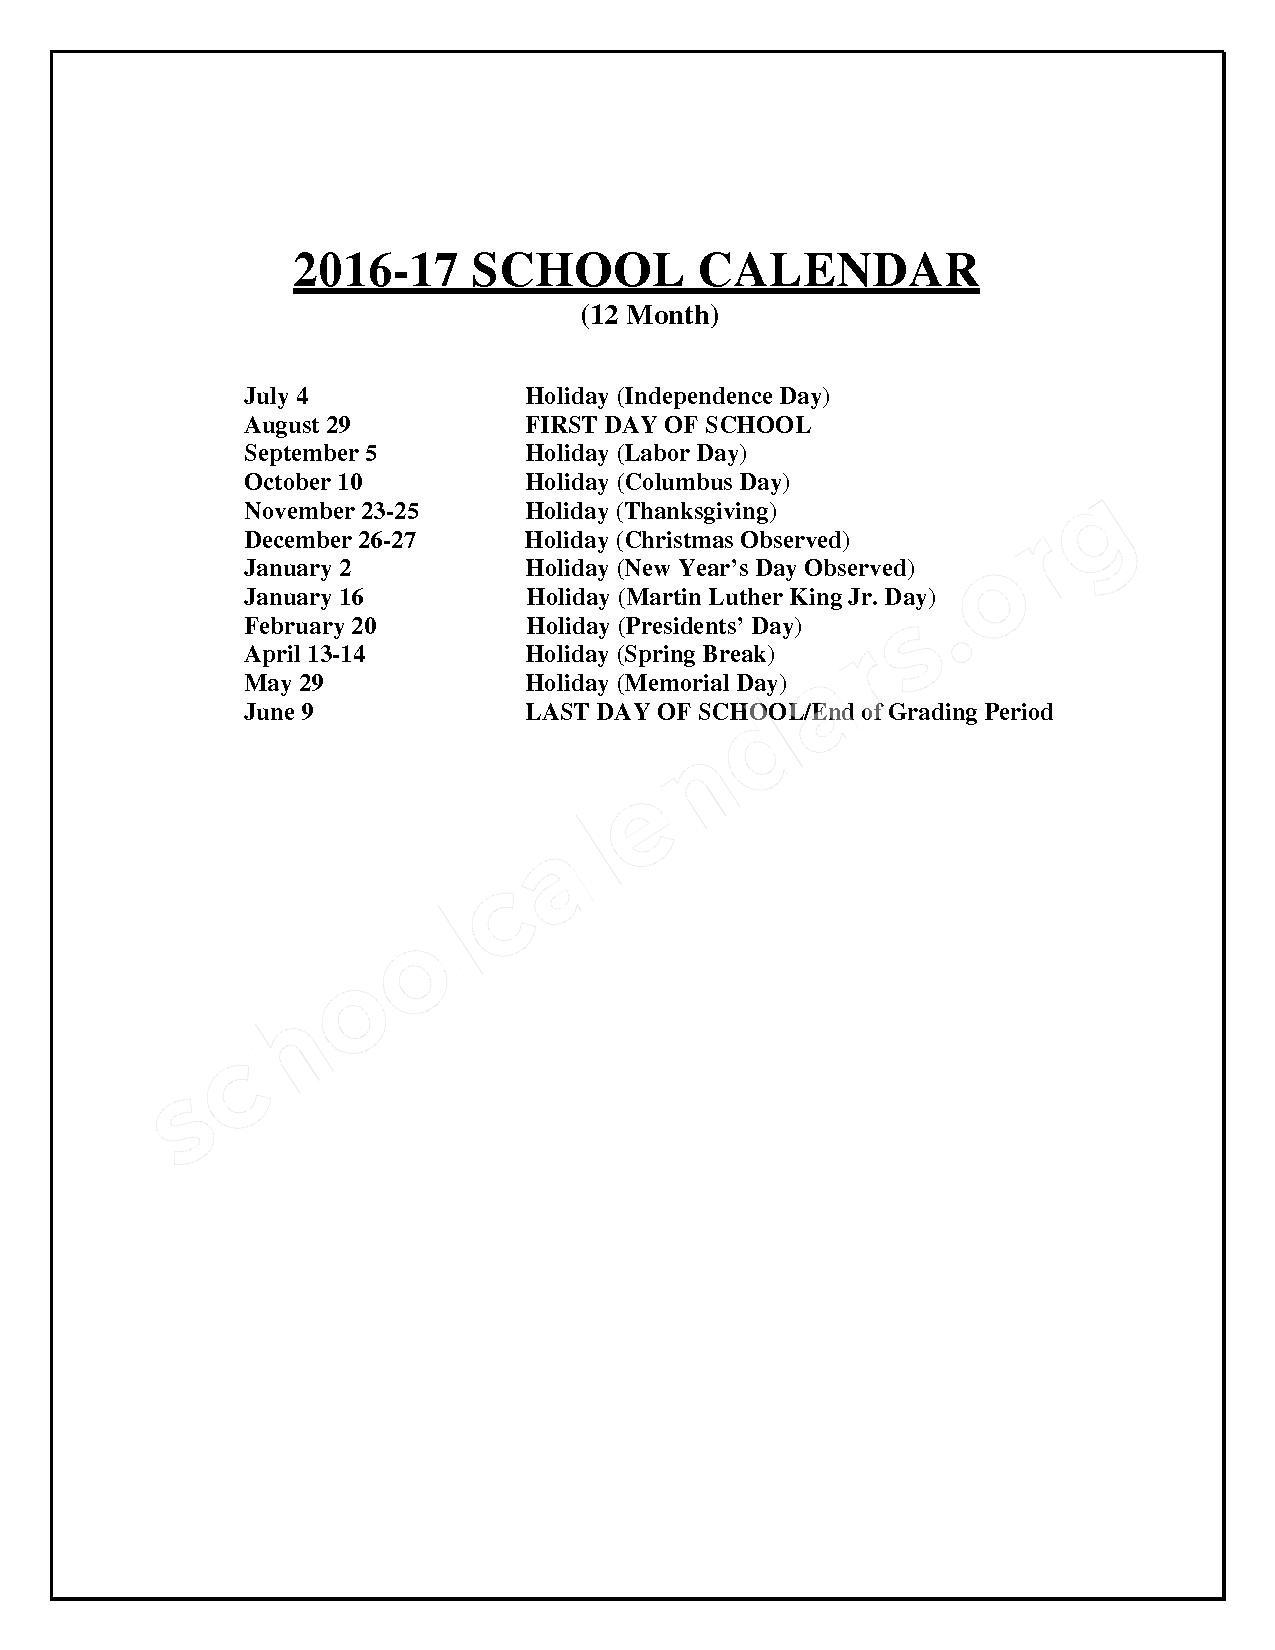 2016 2017staff Calendar Loudoun County Public Schools Ashburn Va